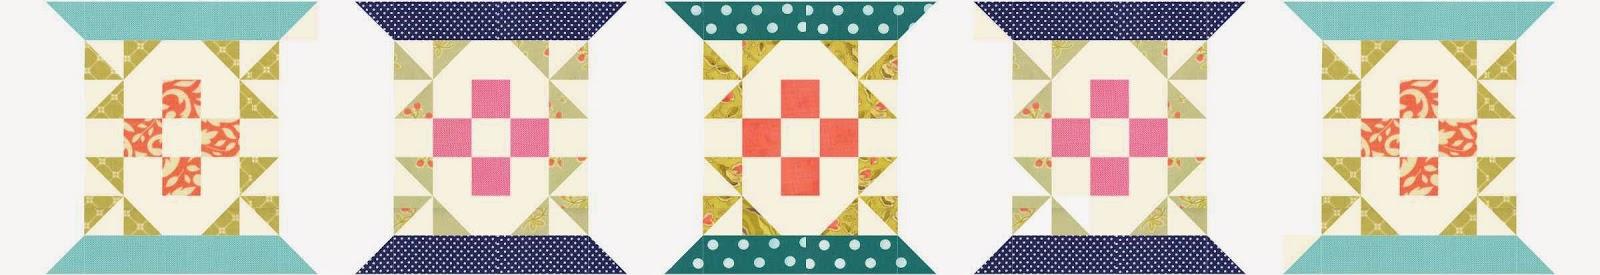 Trifle Dish: Cherry Spools and Lady Fingers Â« Moda Bake Shop : ladyfingers quilt shop - Adamdwight.com